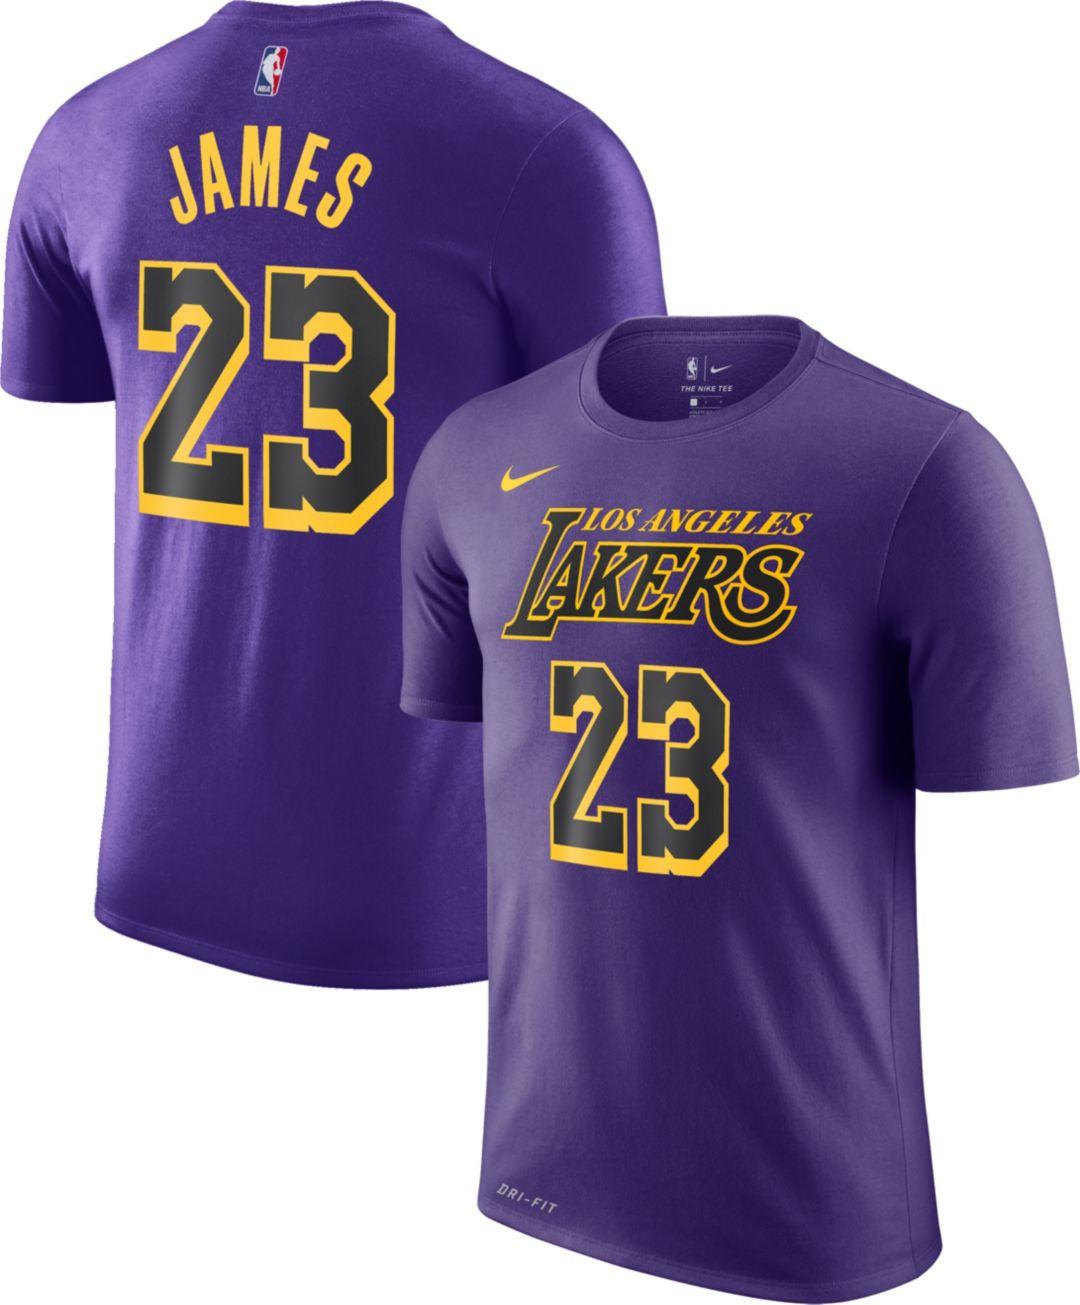 e0f06d13d26 Nike Youth Los Angeles Lakers LeBron James Dri-FIT City Edition T-Shirt 1